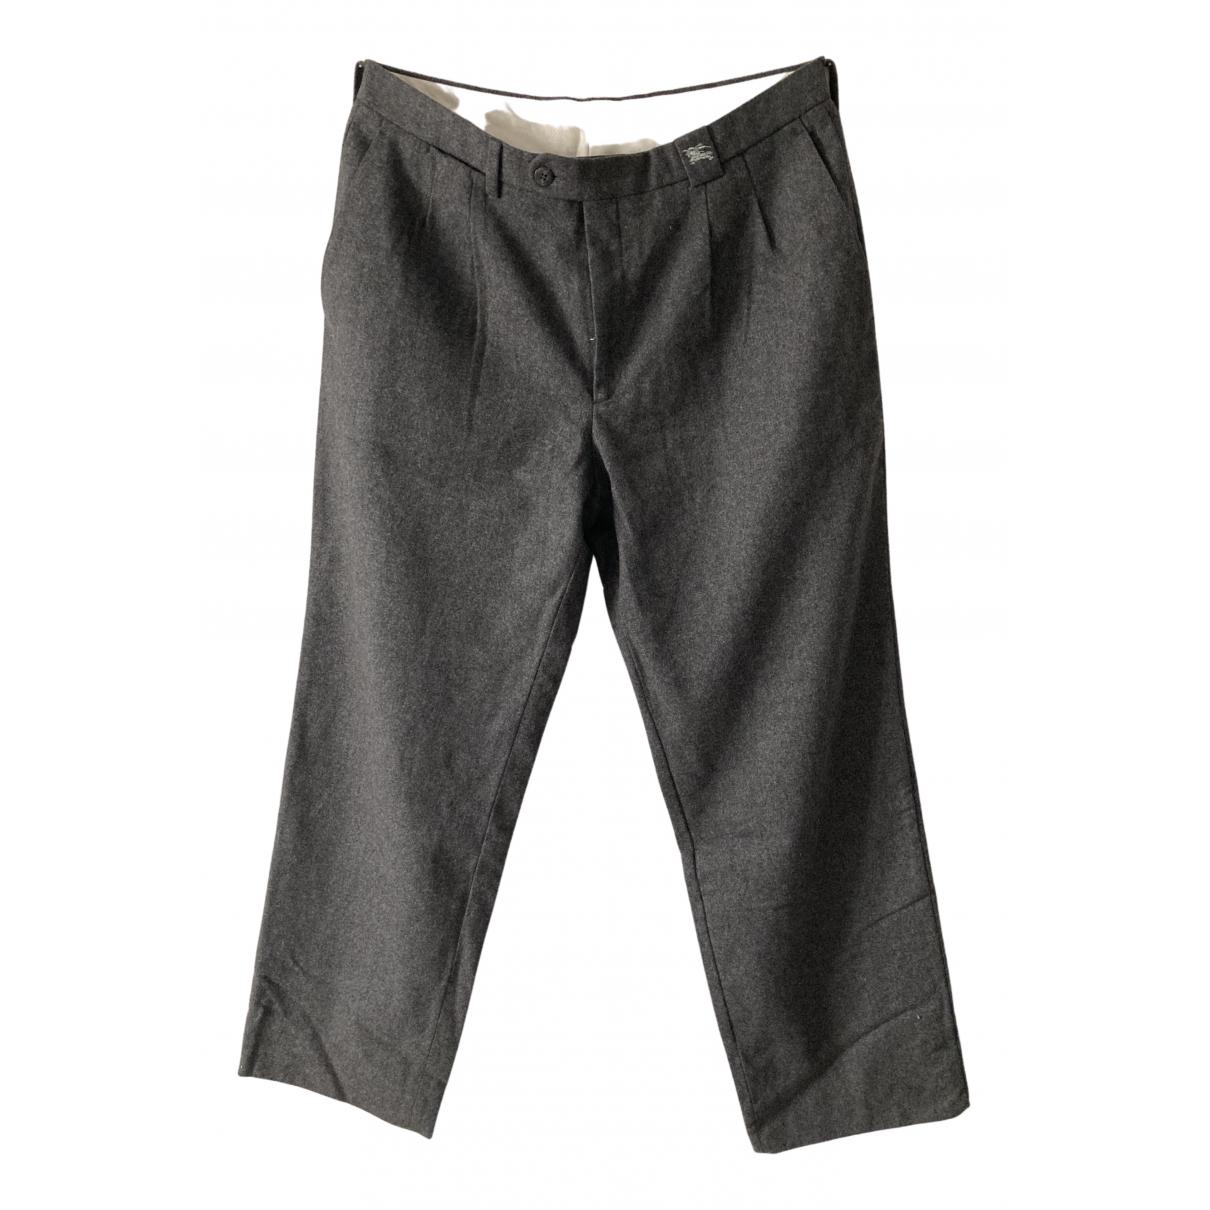 Burberry N Grey Wool Trousers for Men 44 FR